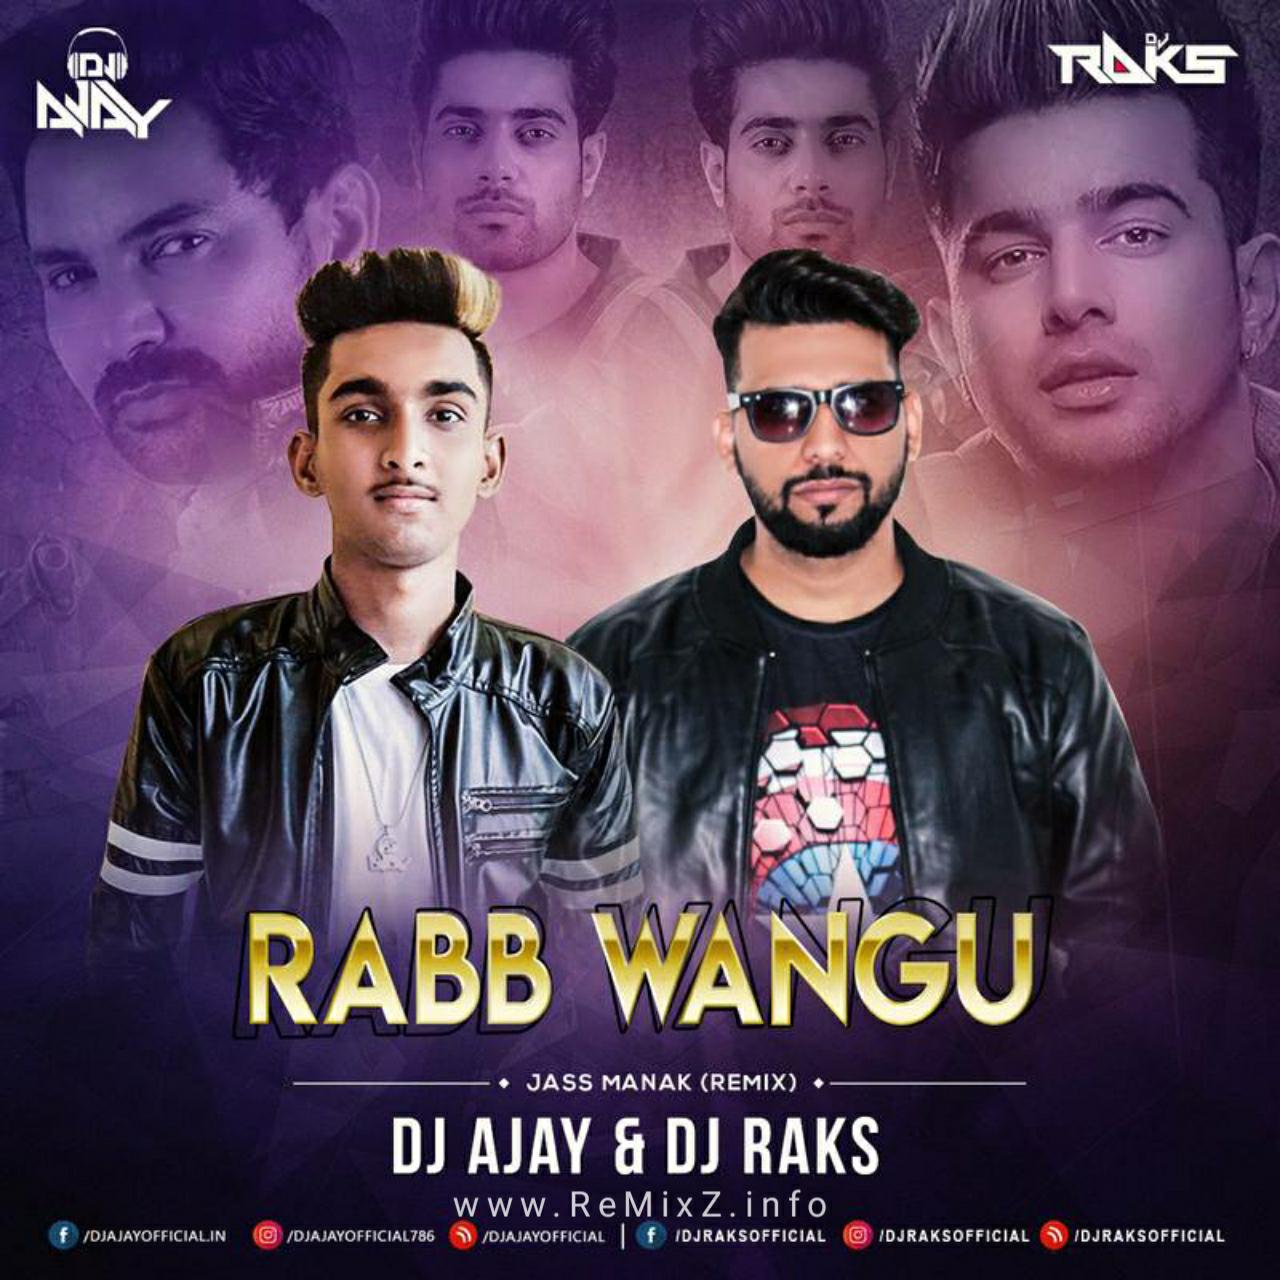 Rabb Wangu - Jass Manak Remix DJ AJAY x DJ RAKS